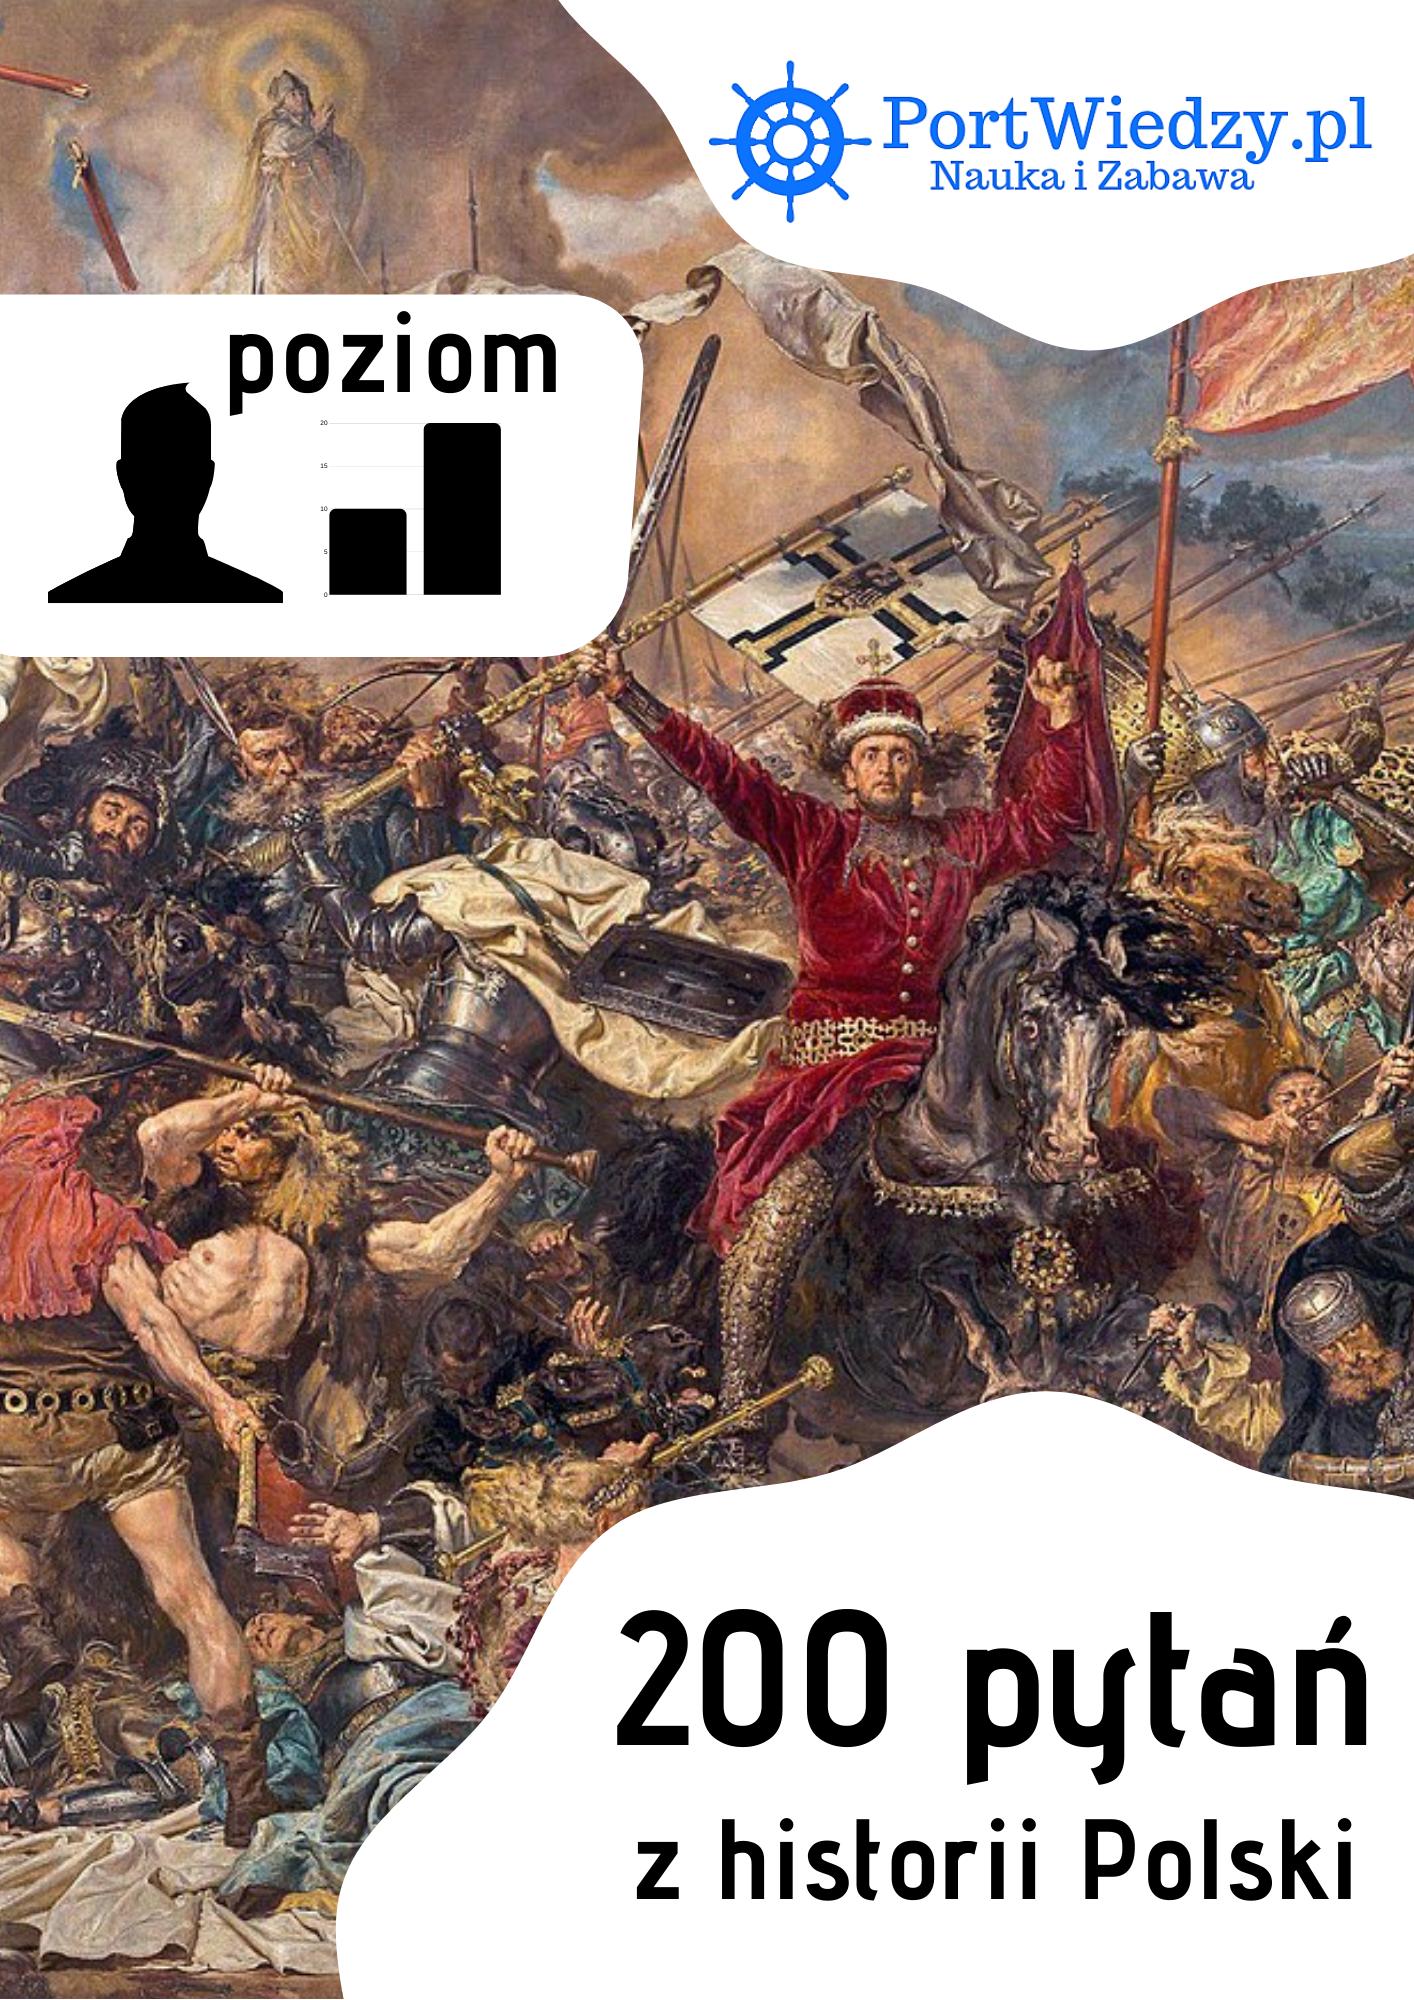 200pytan - 200pytan